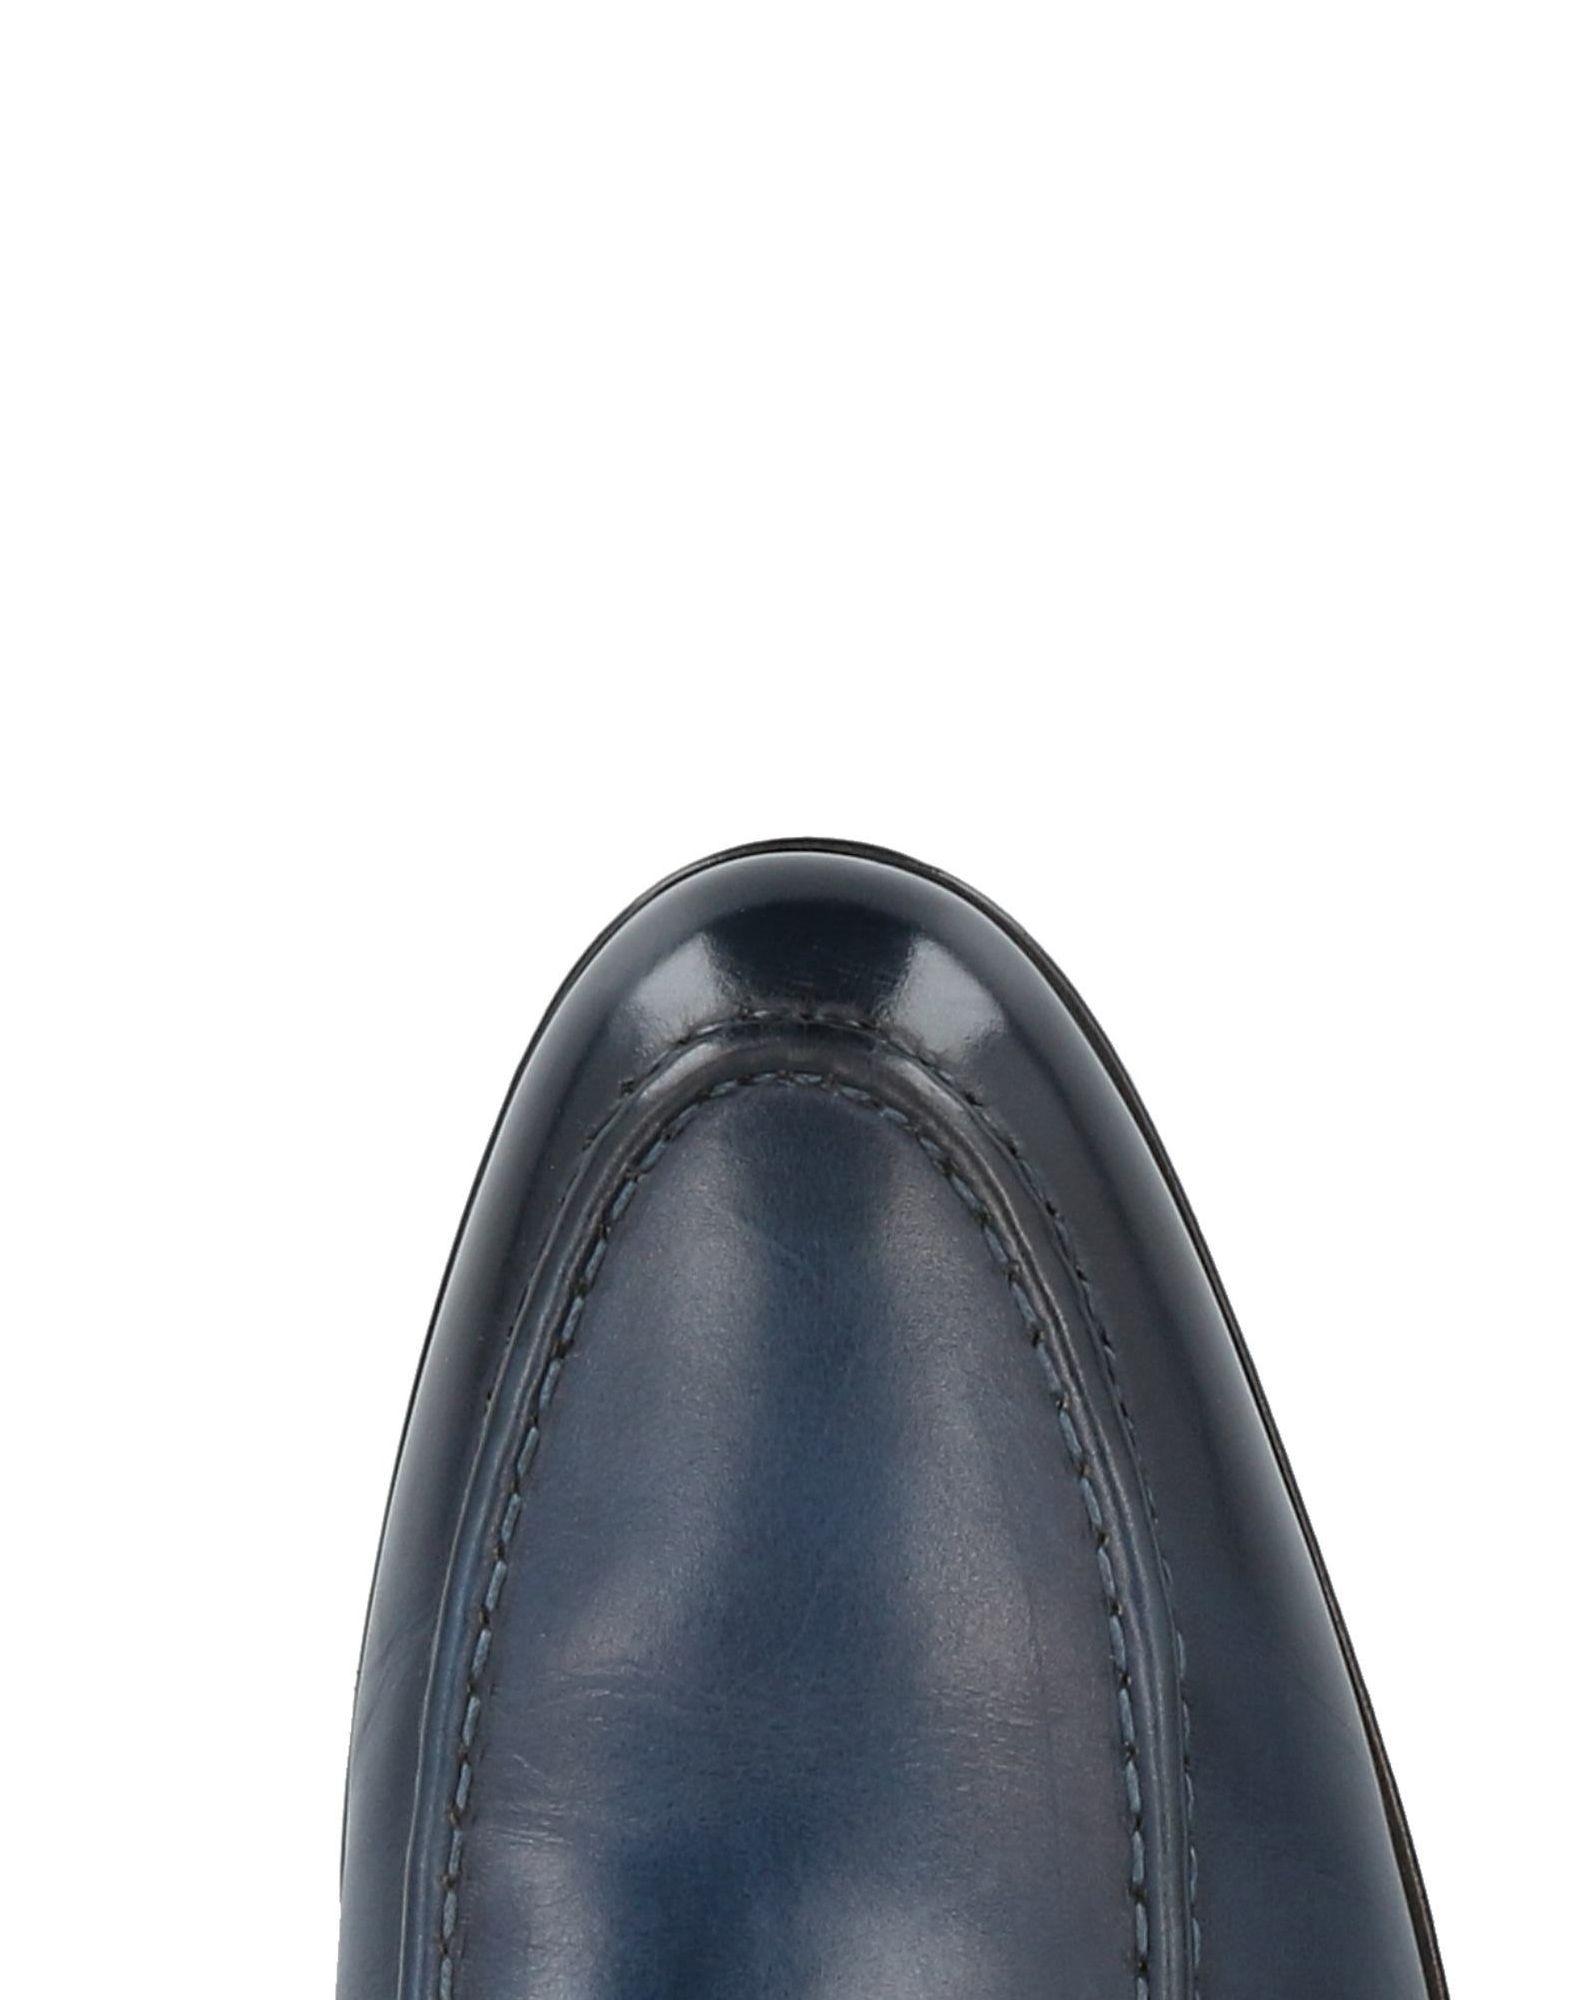 Santoni Mokassins Herren  11442750VD Gute Qualität beliebte Schuhe